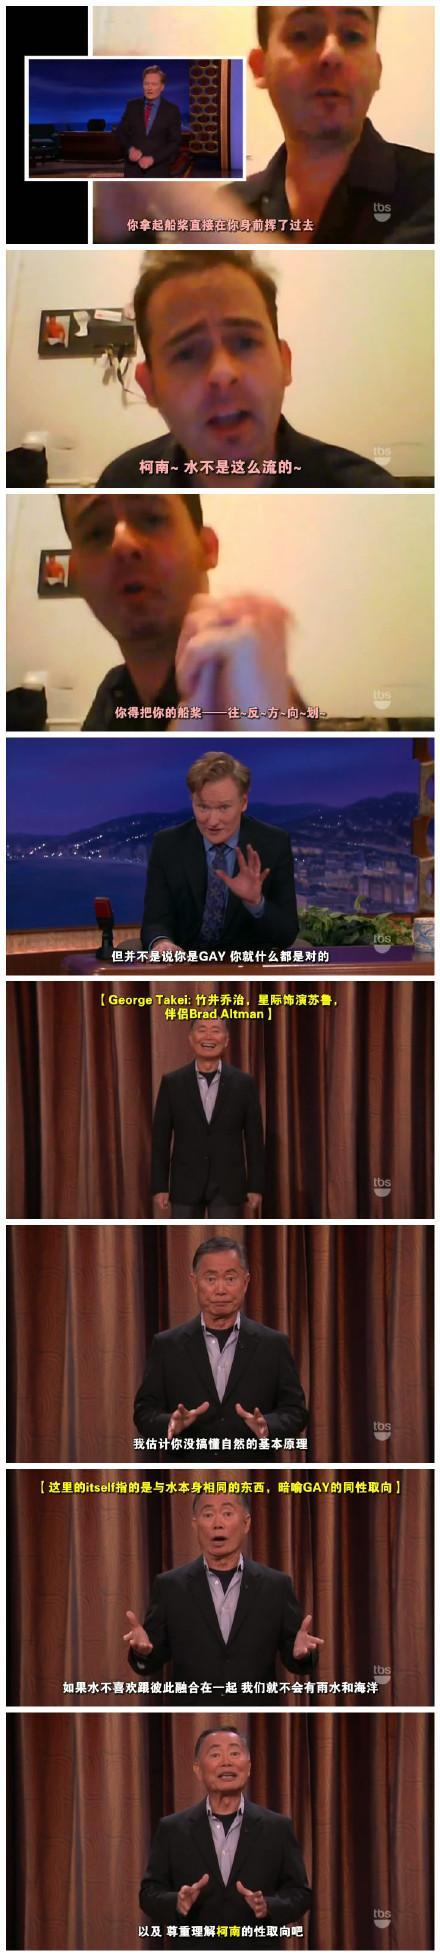 柯南秀 2013.06.10 高清中字 又到了Fan Corrections的环节